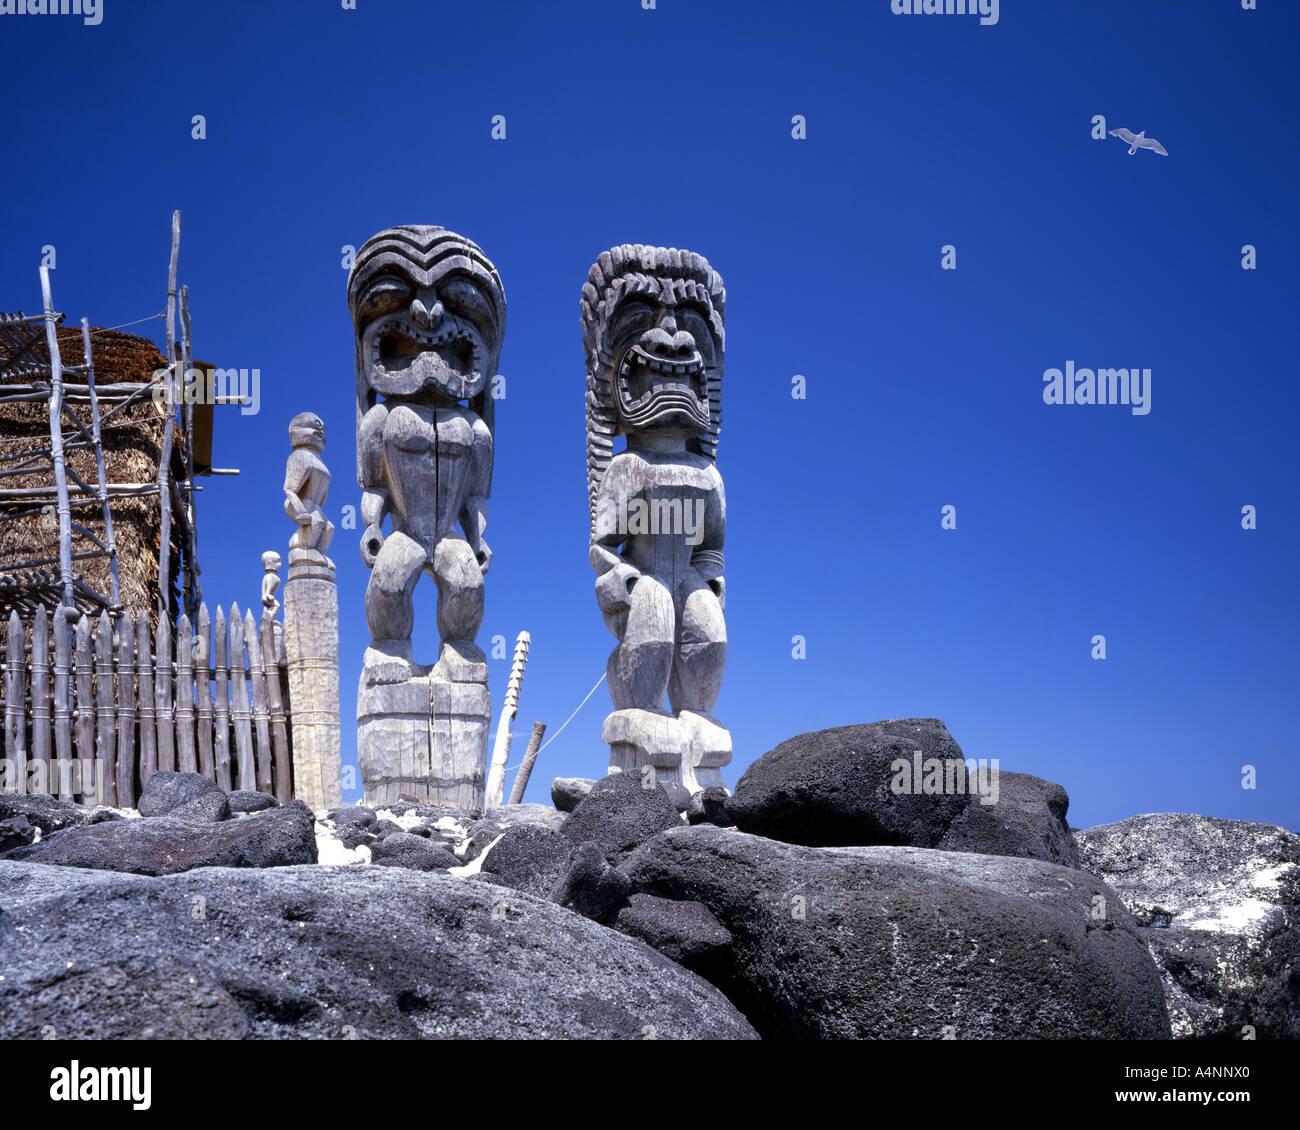 USA - HAWAII:  Pu'uhonua Honaunau Refuge on Big Island - Stock Image